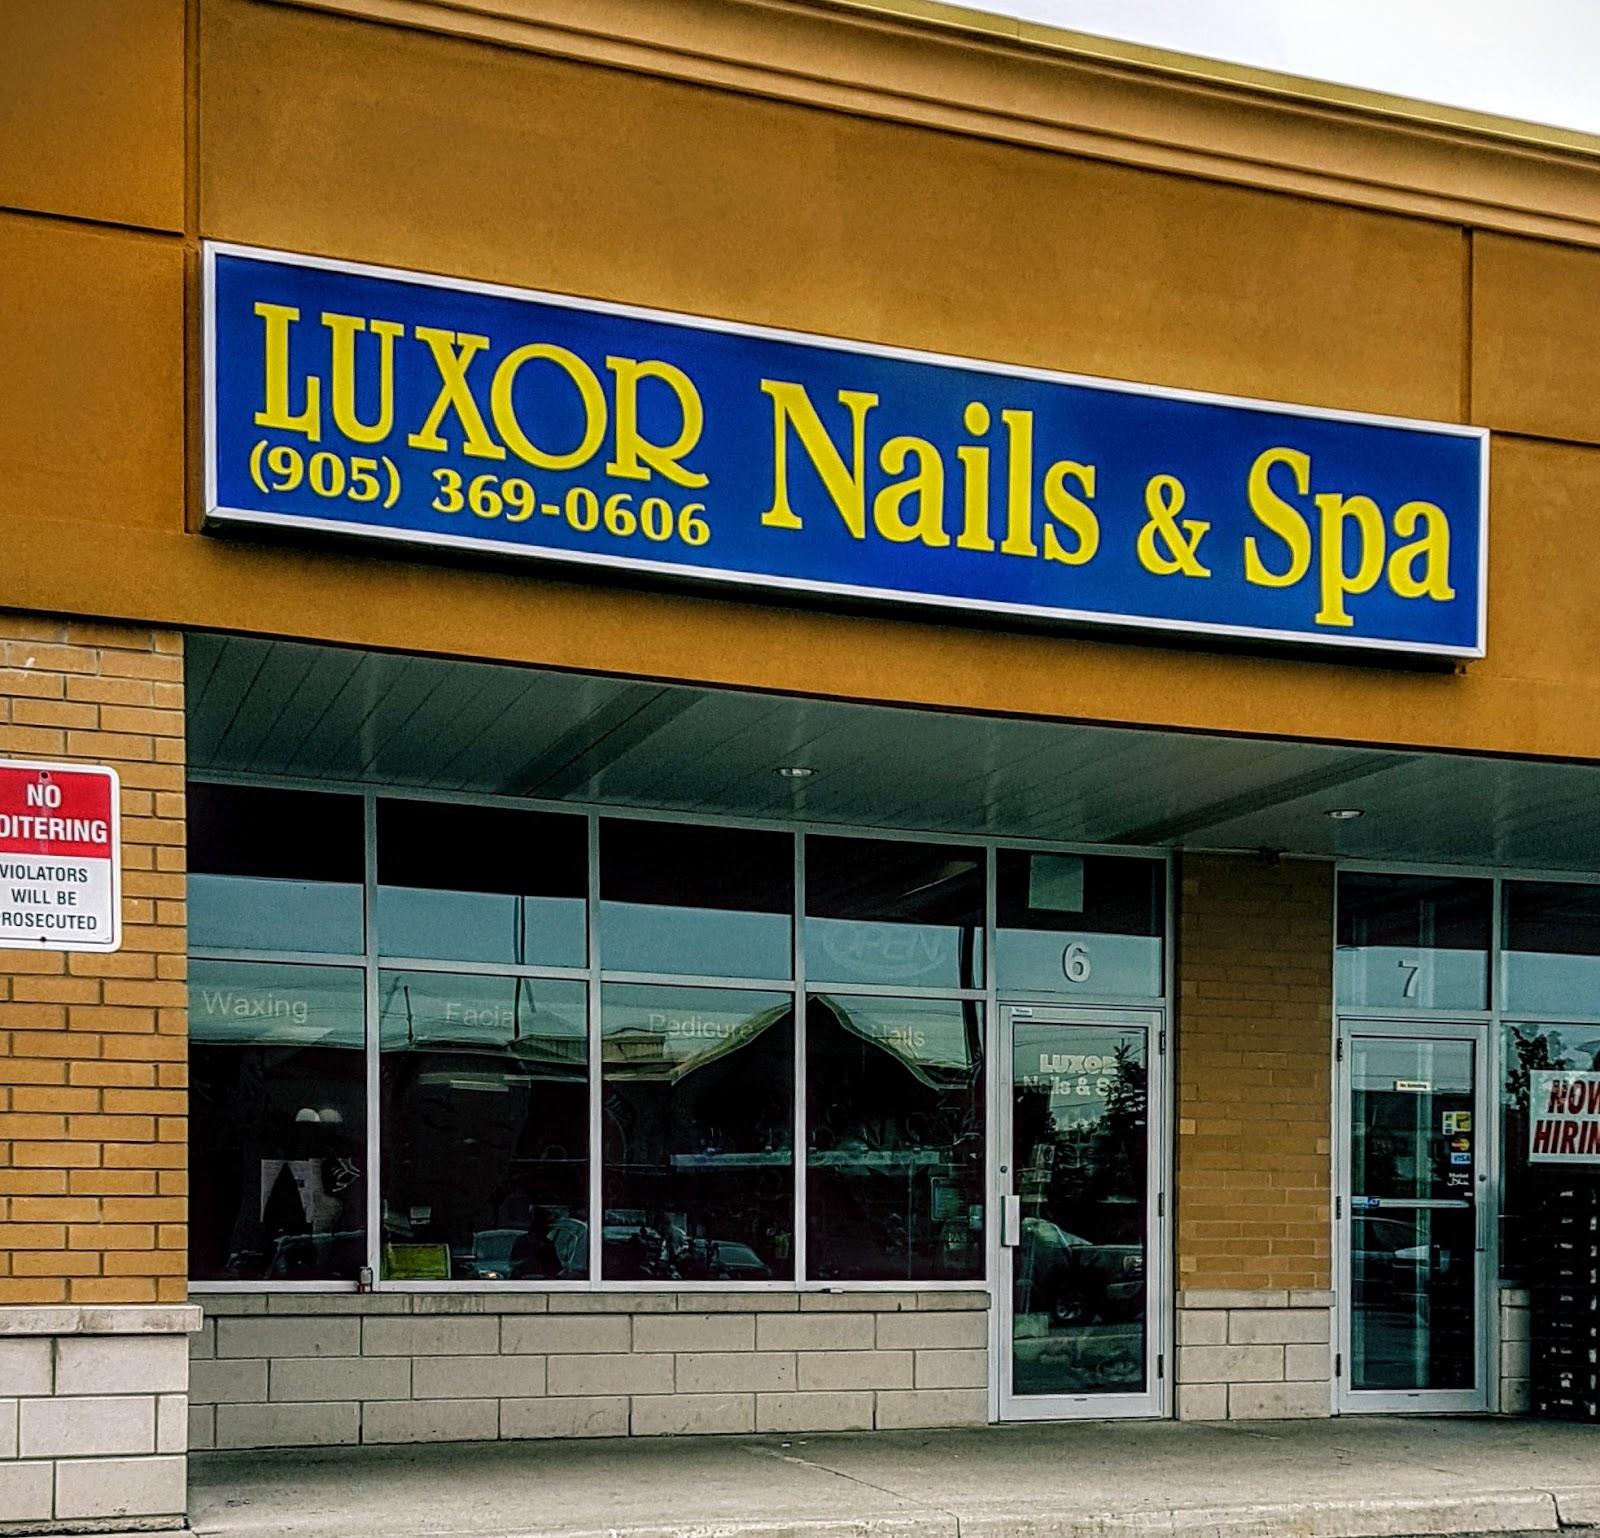 Luxor Nails And Spa - Beauty Salon - 1 Photo & 9 Reviews ...